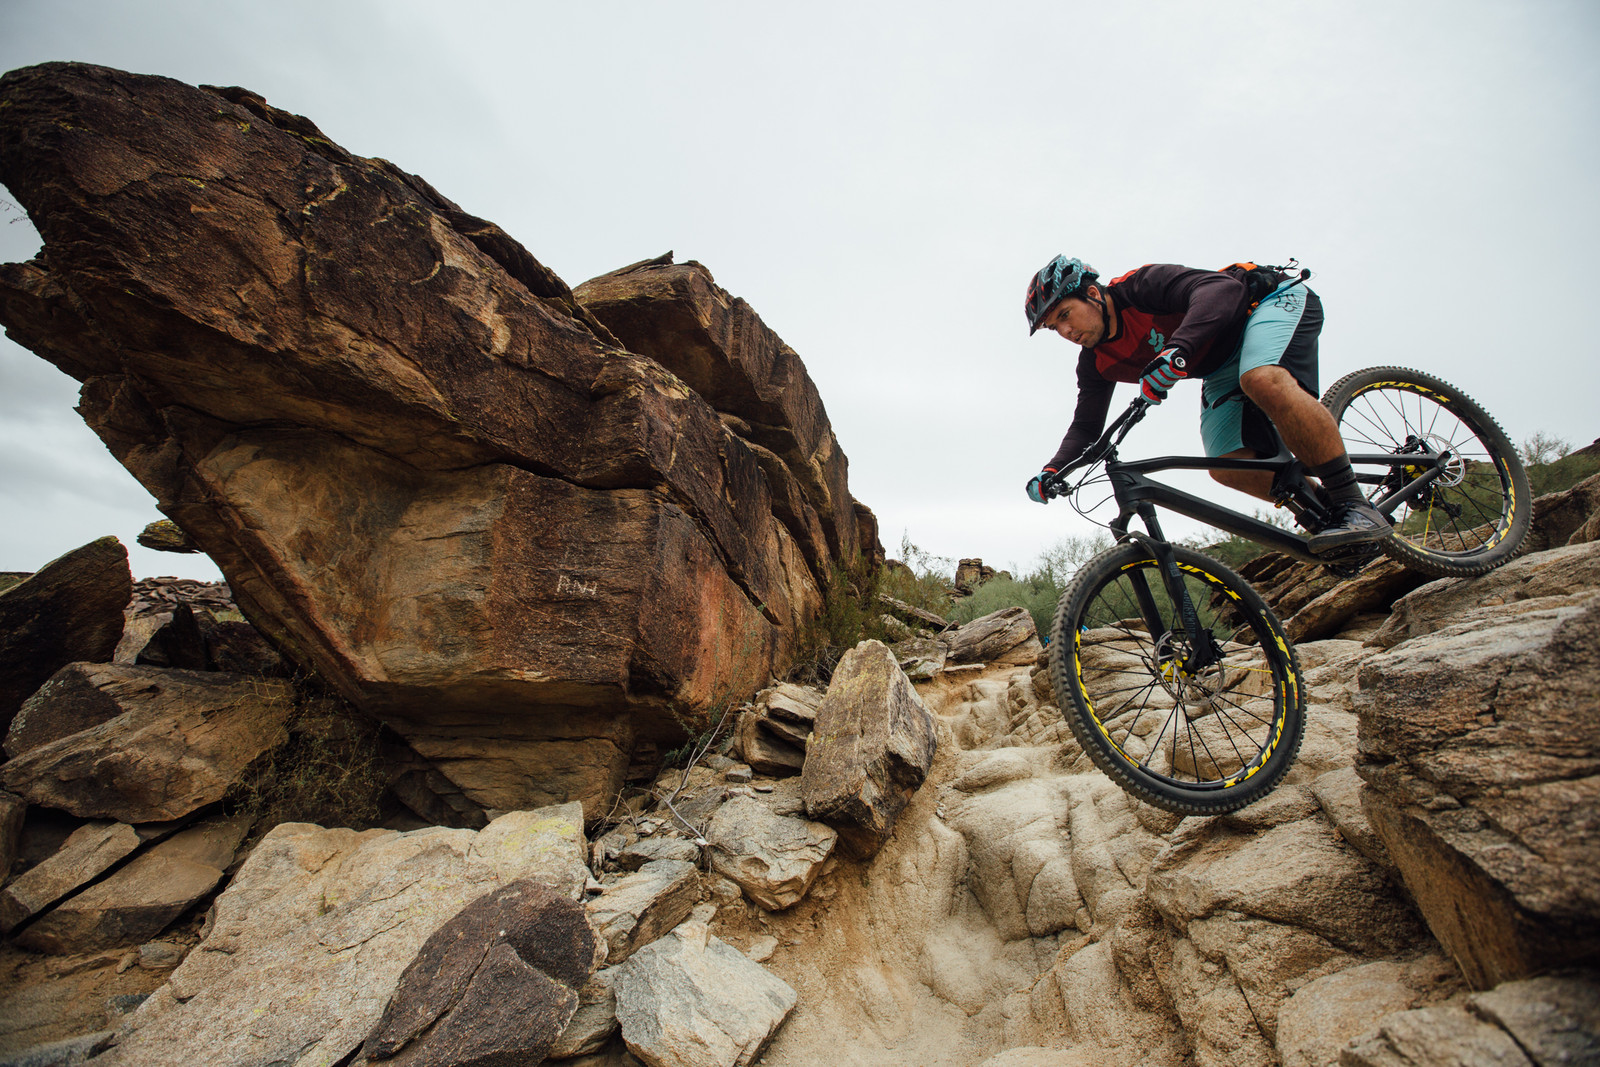 Canyon Spectral CF 9.0 EX - 2016 Vital MTB Test Sessions - Canyon Spectral CF 9.0 EX - 2016 Vital MTB Test Sessions - Mountain Biking Pictures - Vital MTB